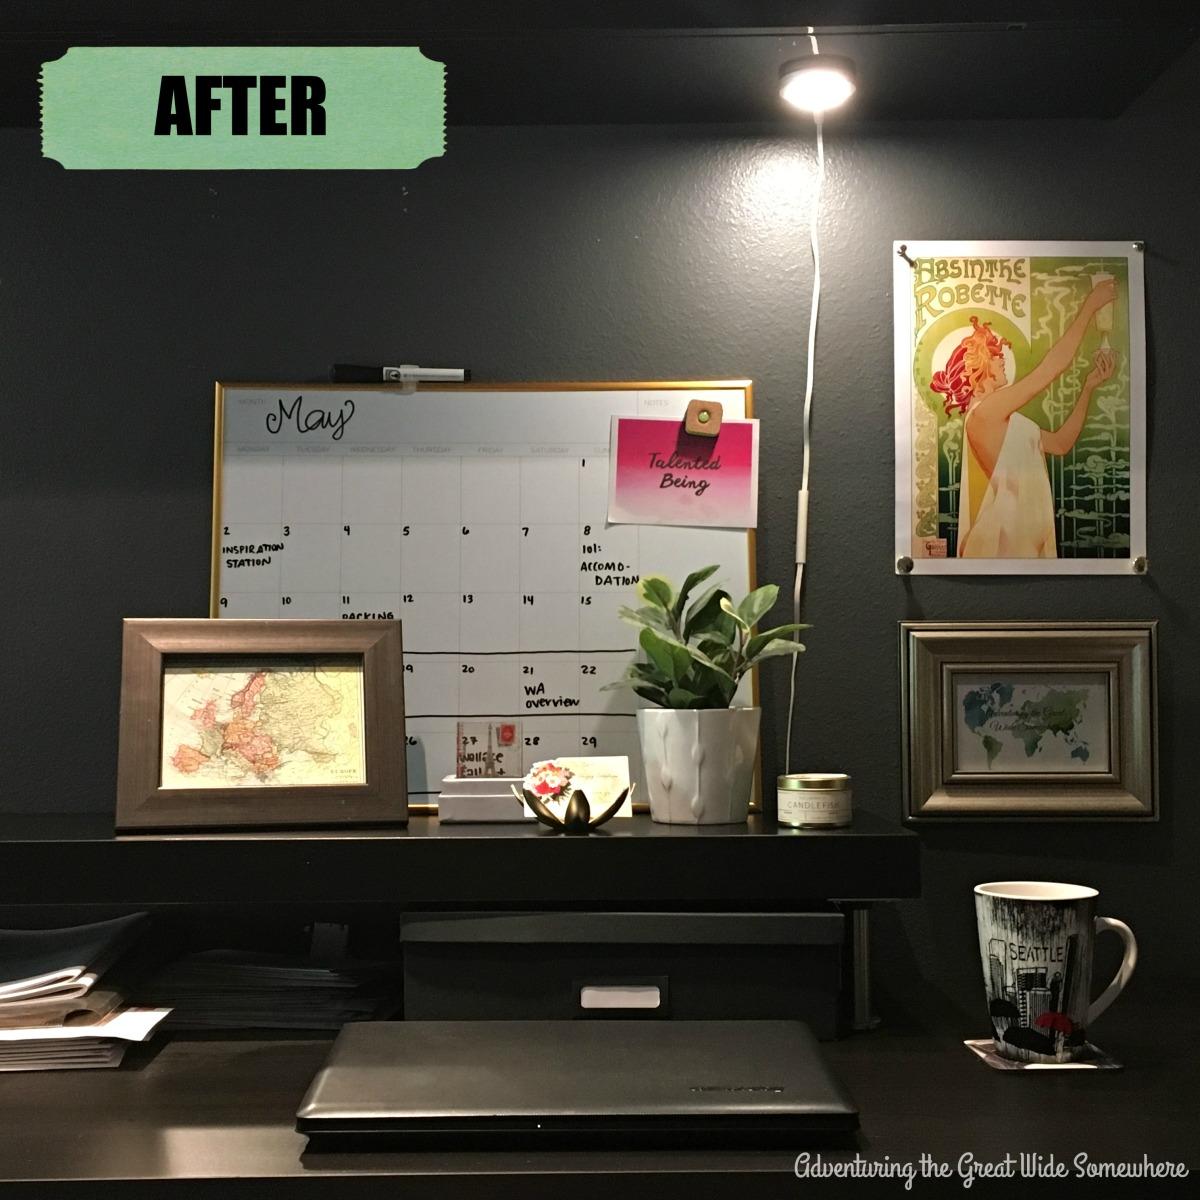 Messy Desk Makeover, After Photo